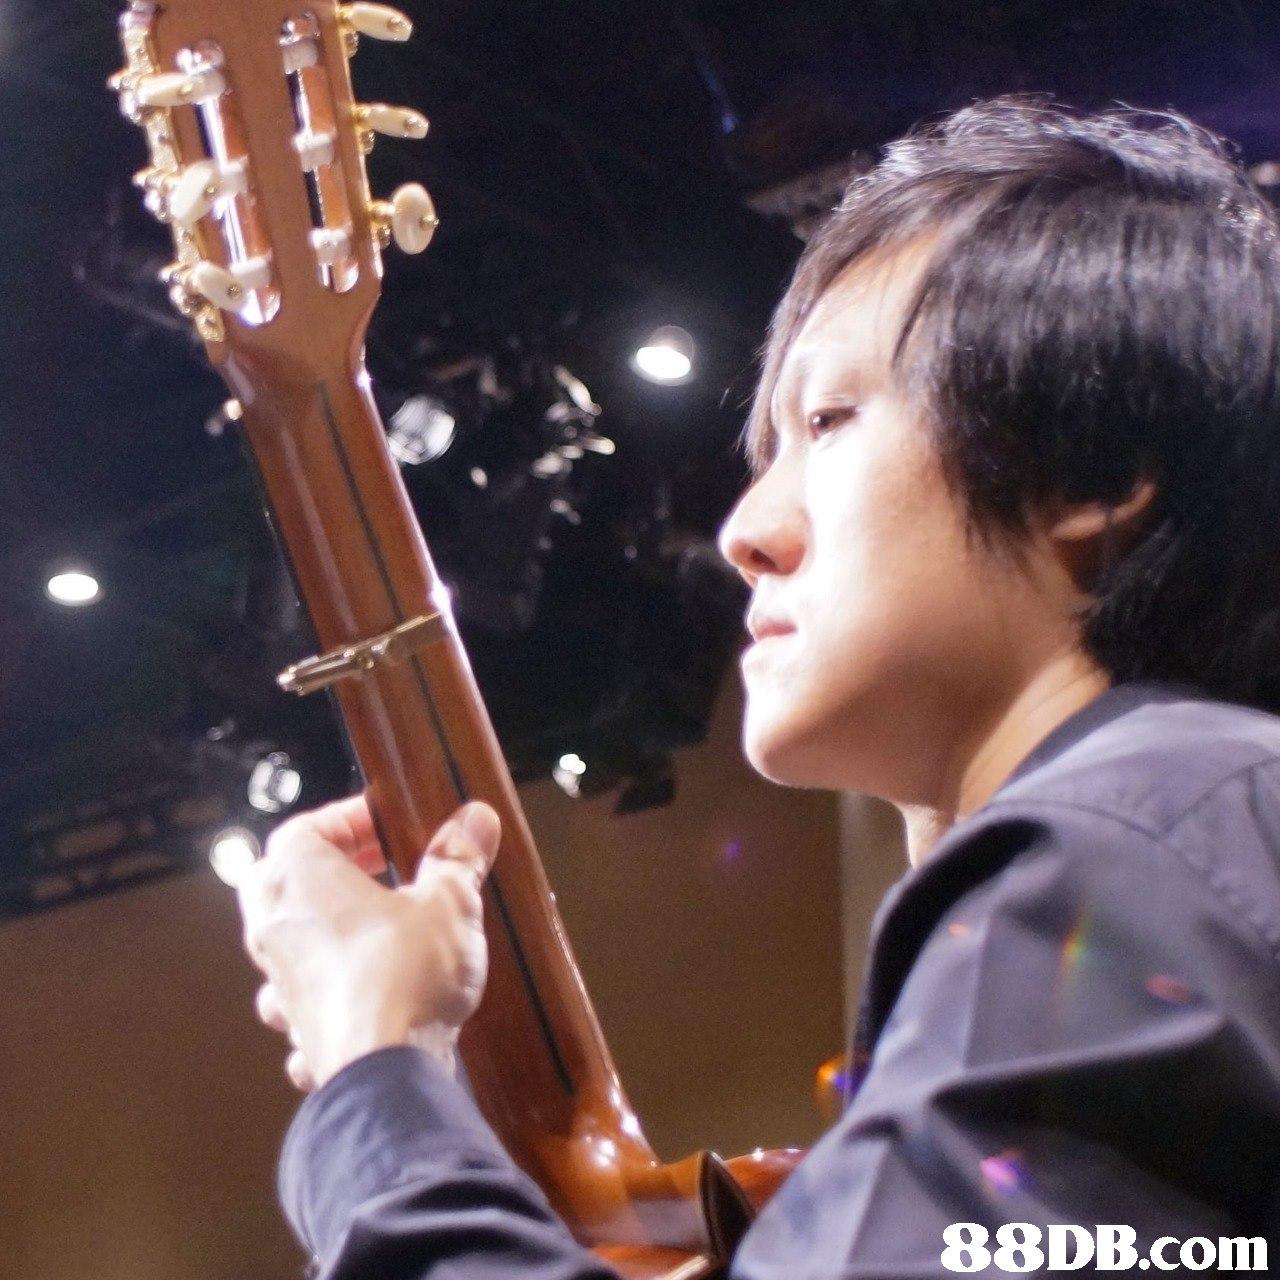 Musical instrument,String instrument,String instrument,Music,Plucked string instruments